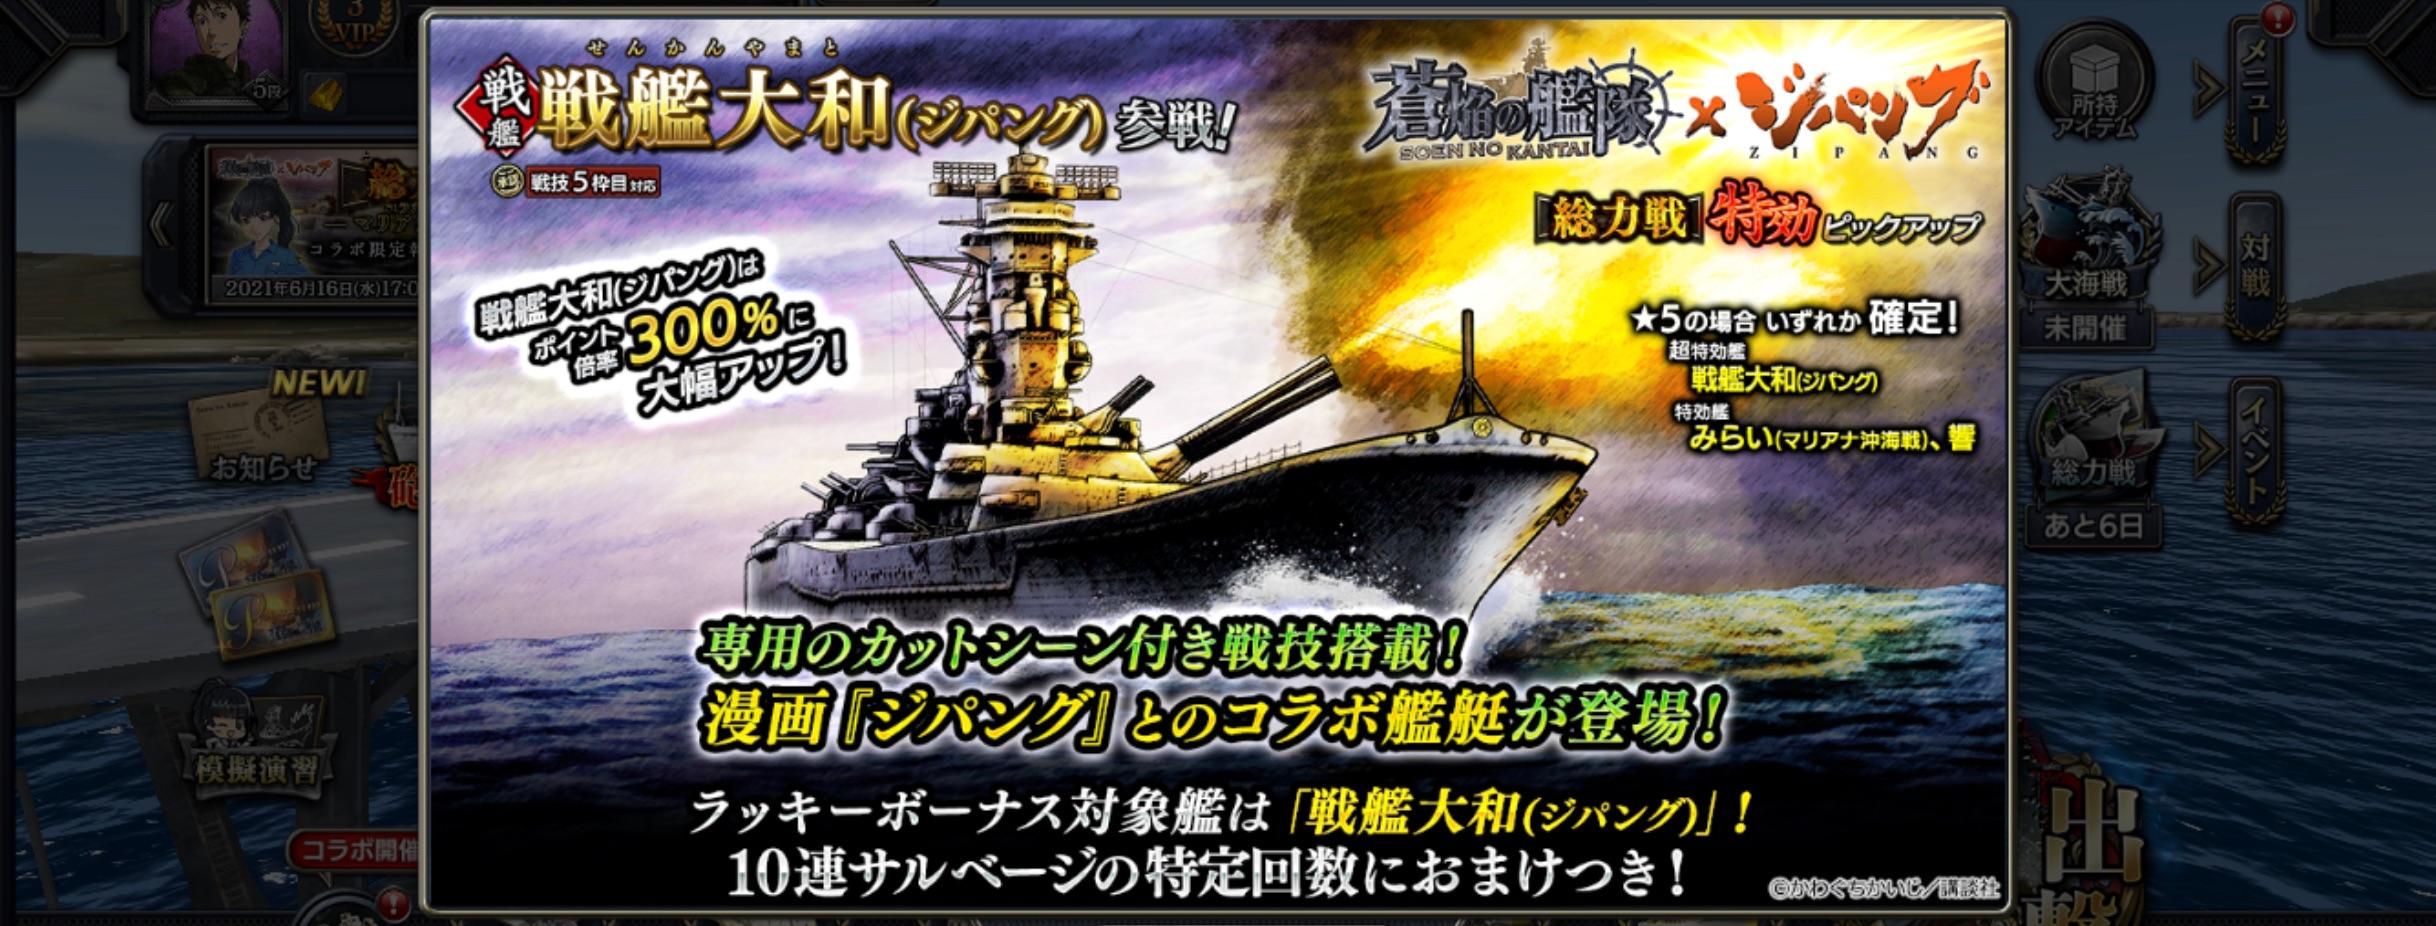 battleship-SyamatoJ